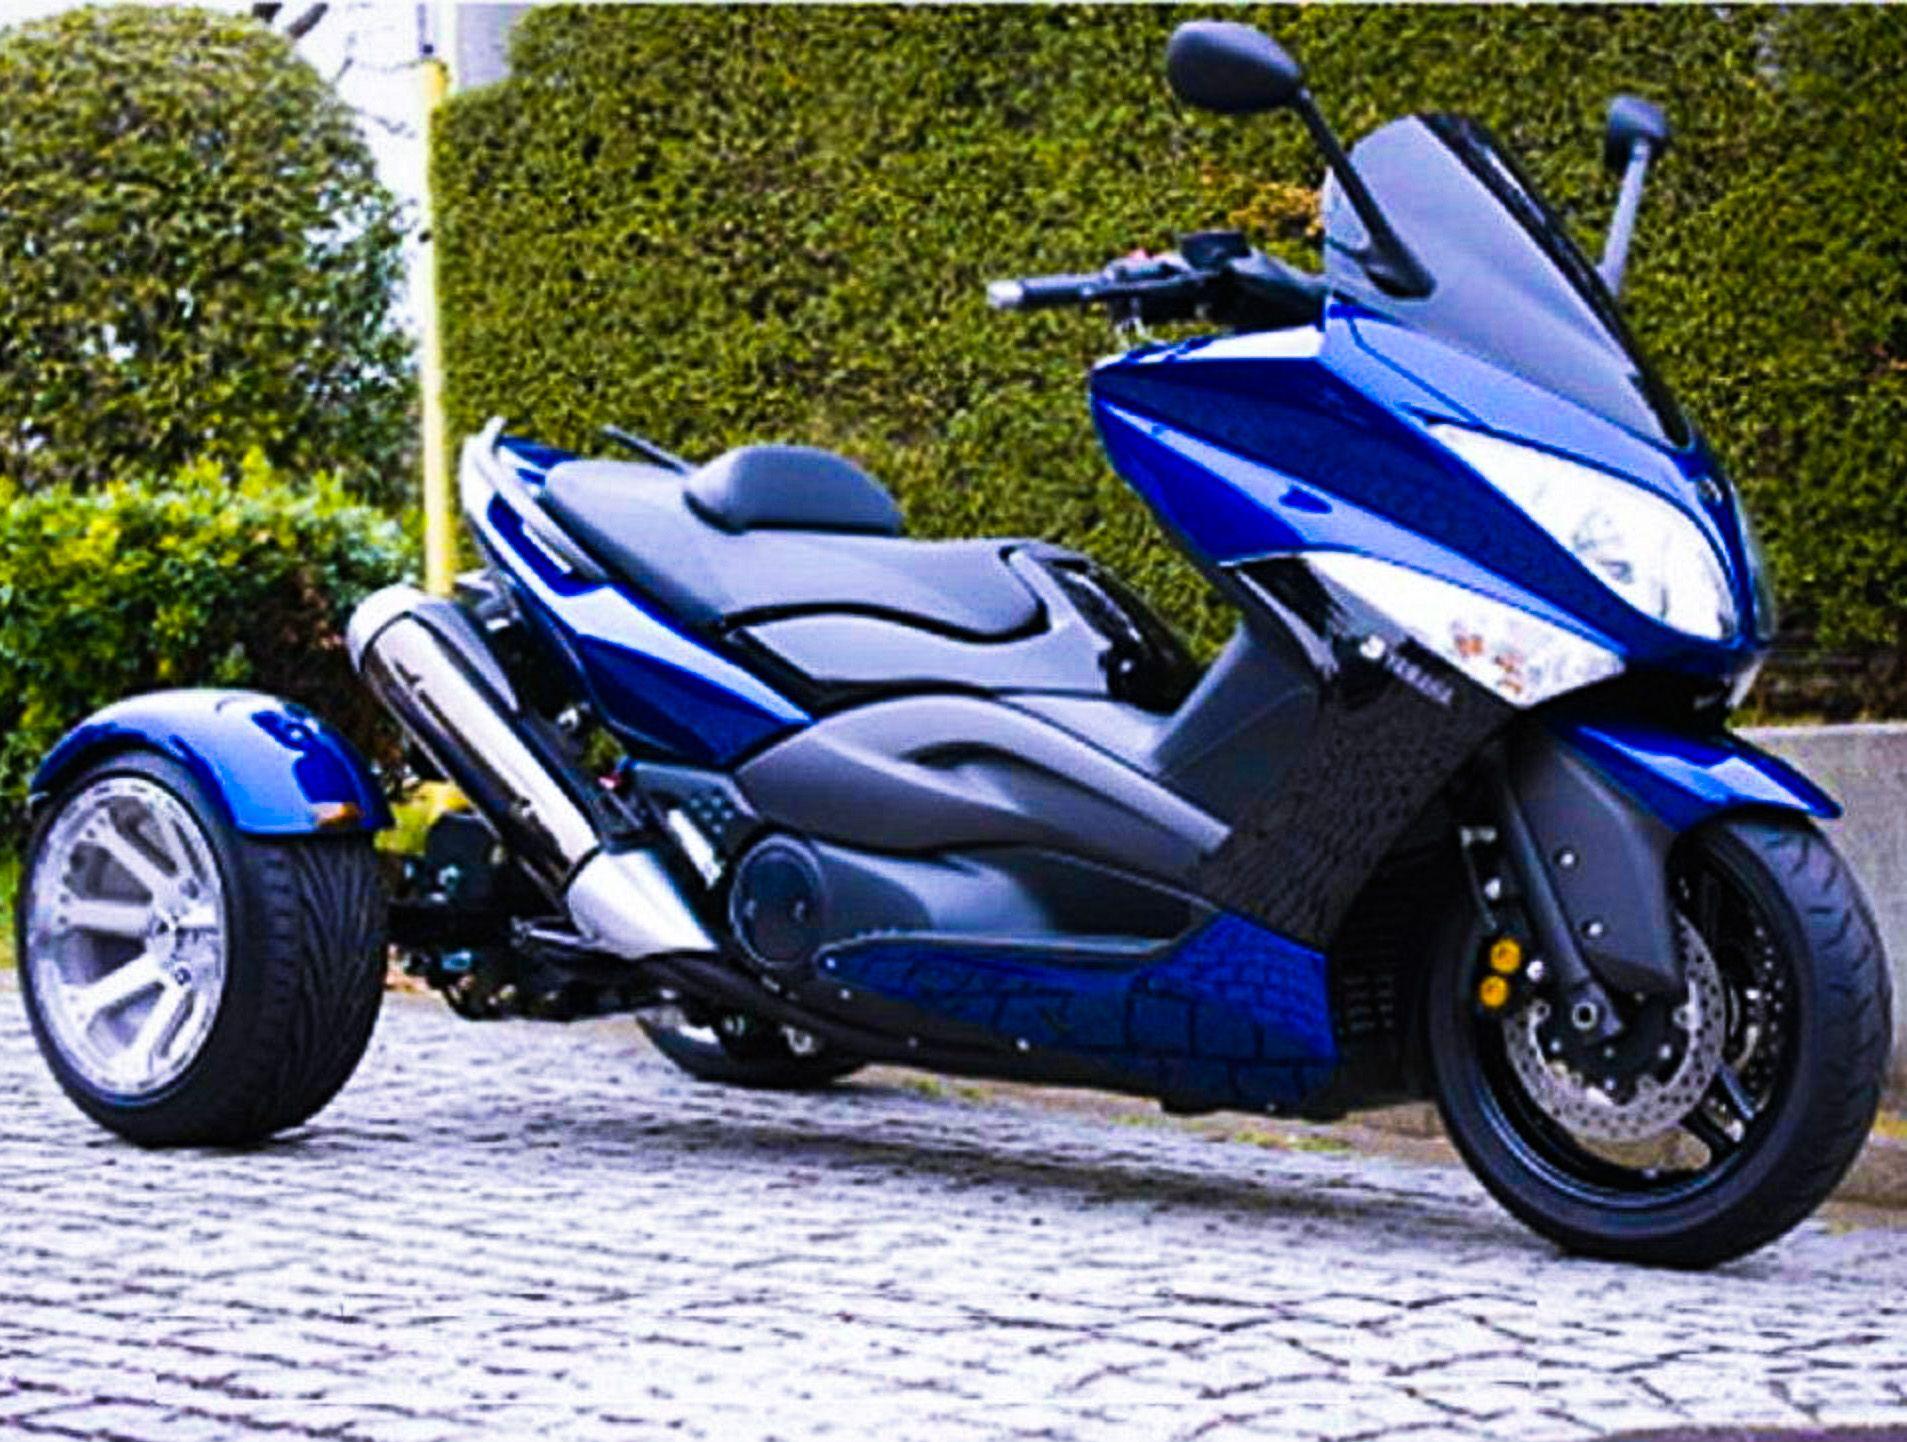 Yamaha T Max 500 Trike Http Scooter Station Com Yamaha Tmax 500